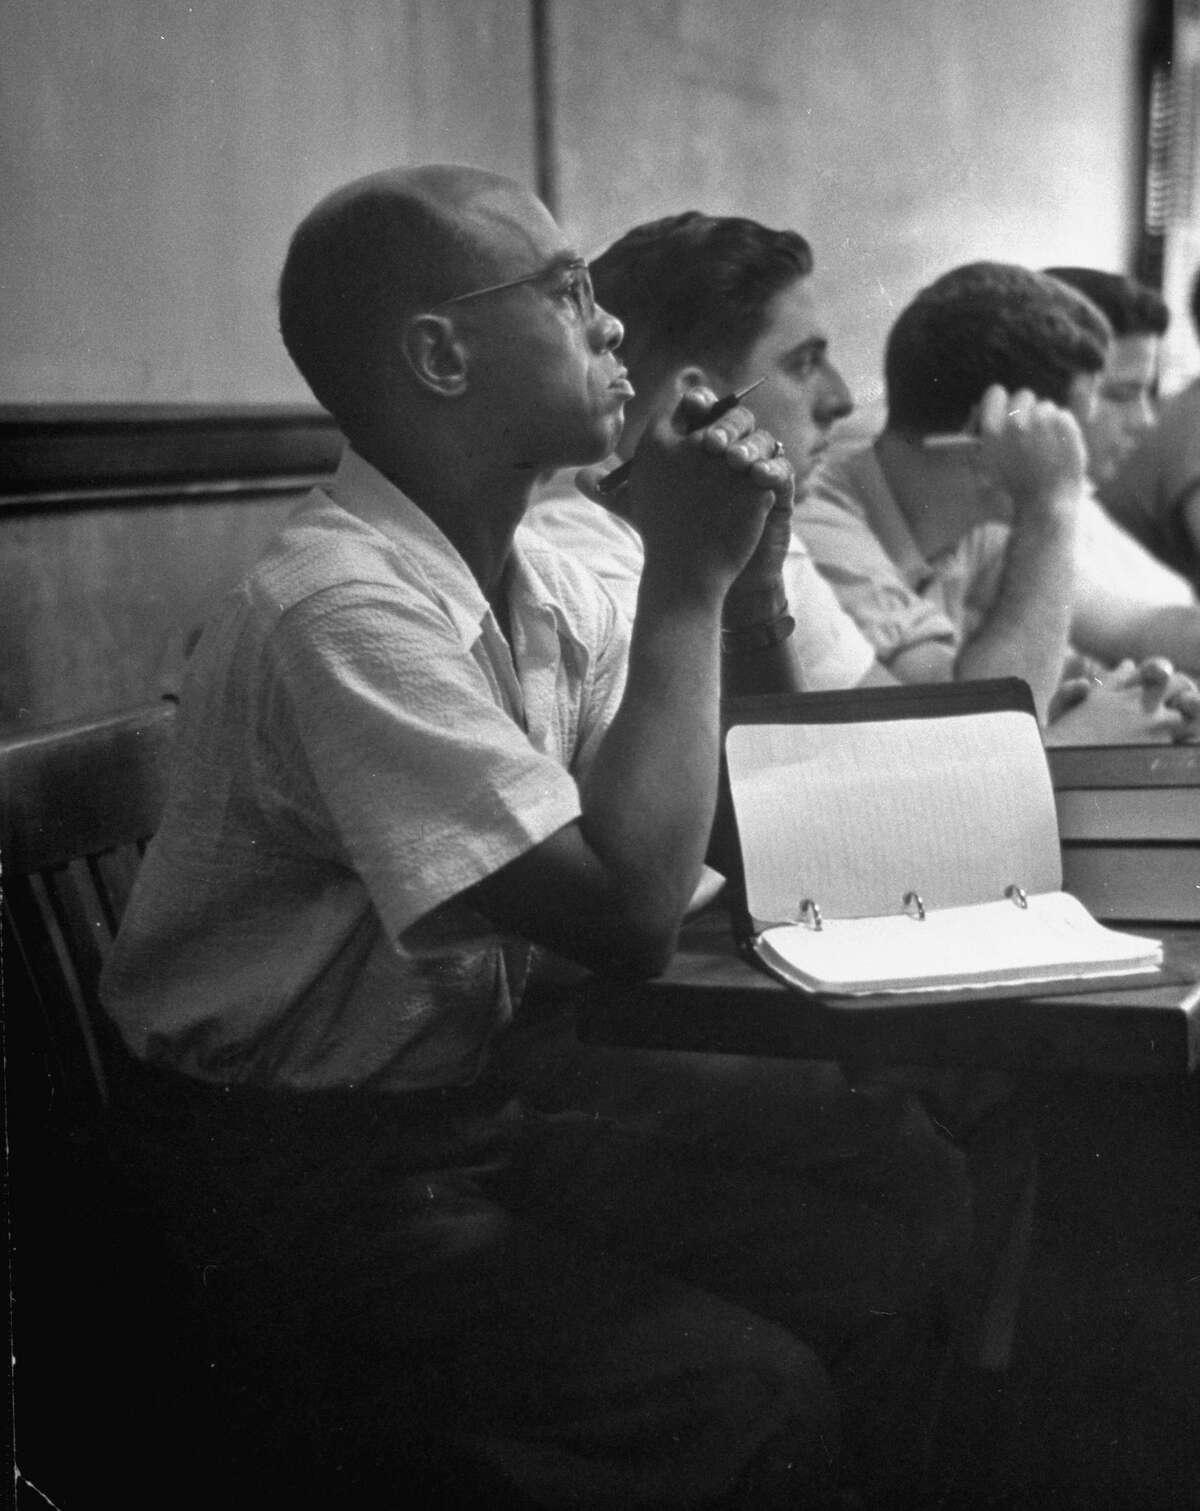 September 1950: Heman Marion Sweatt (L) in his first law class at Texas Univ.